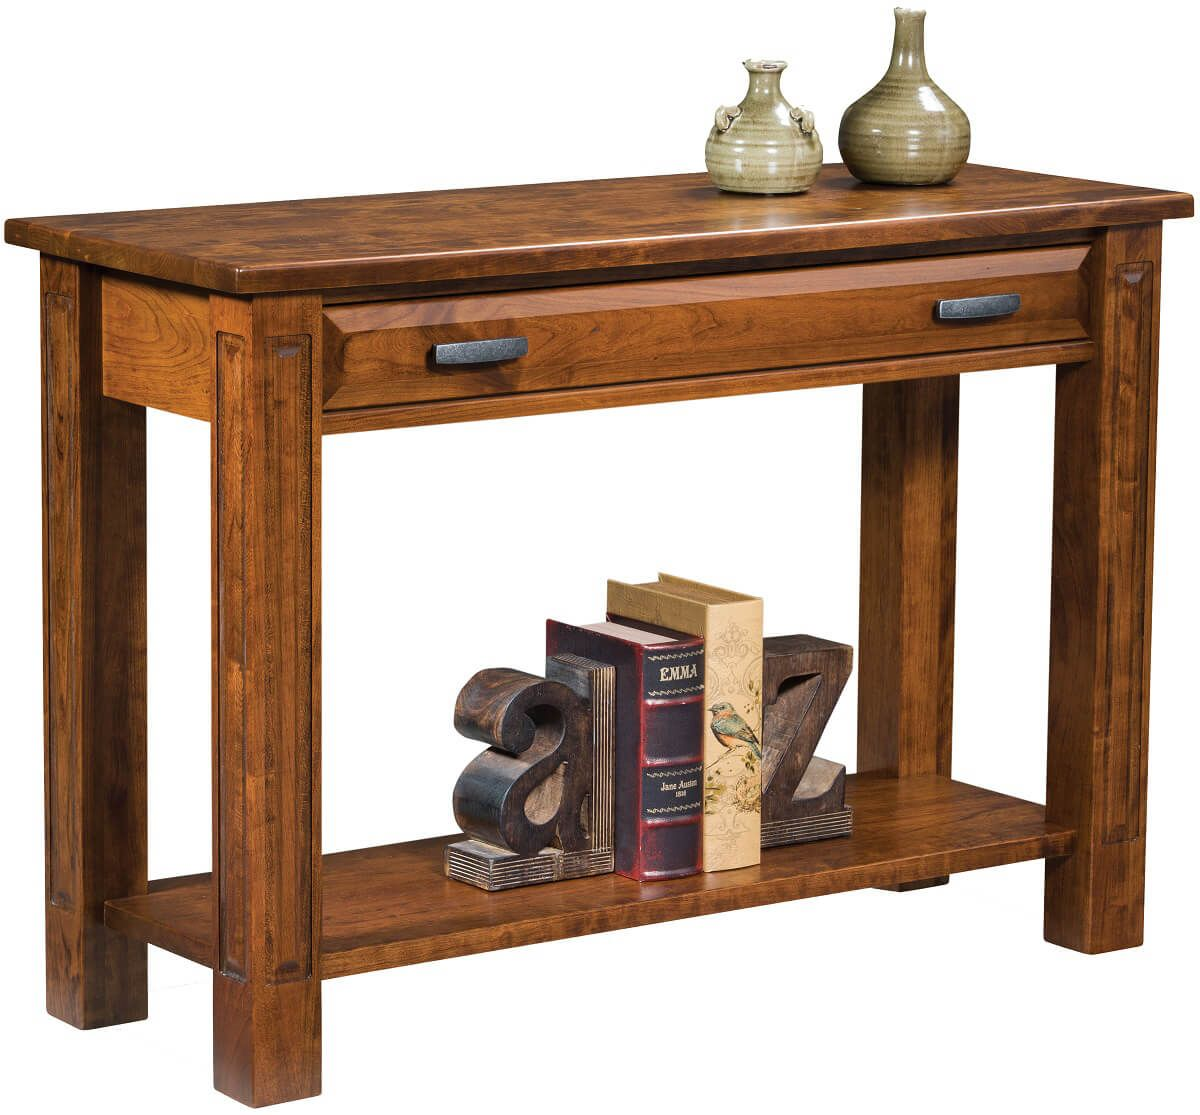 Fairbury Console Table